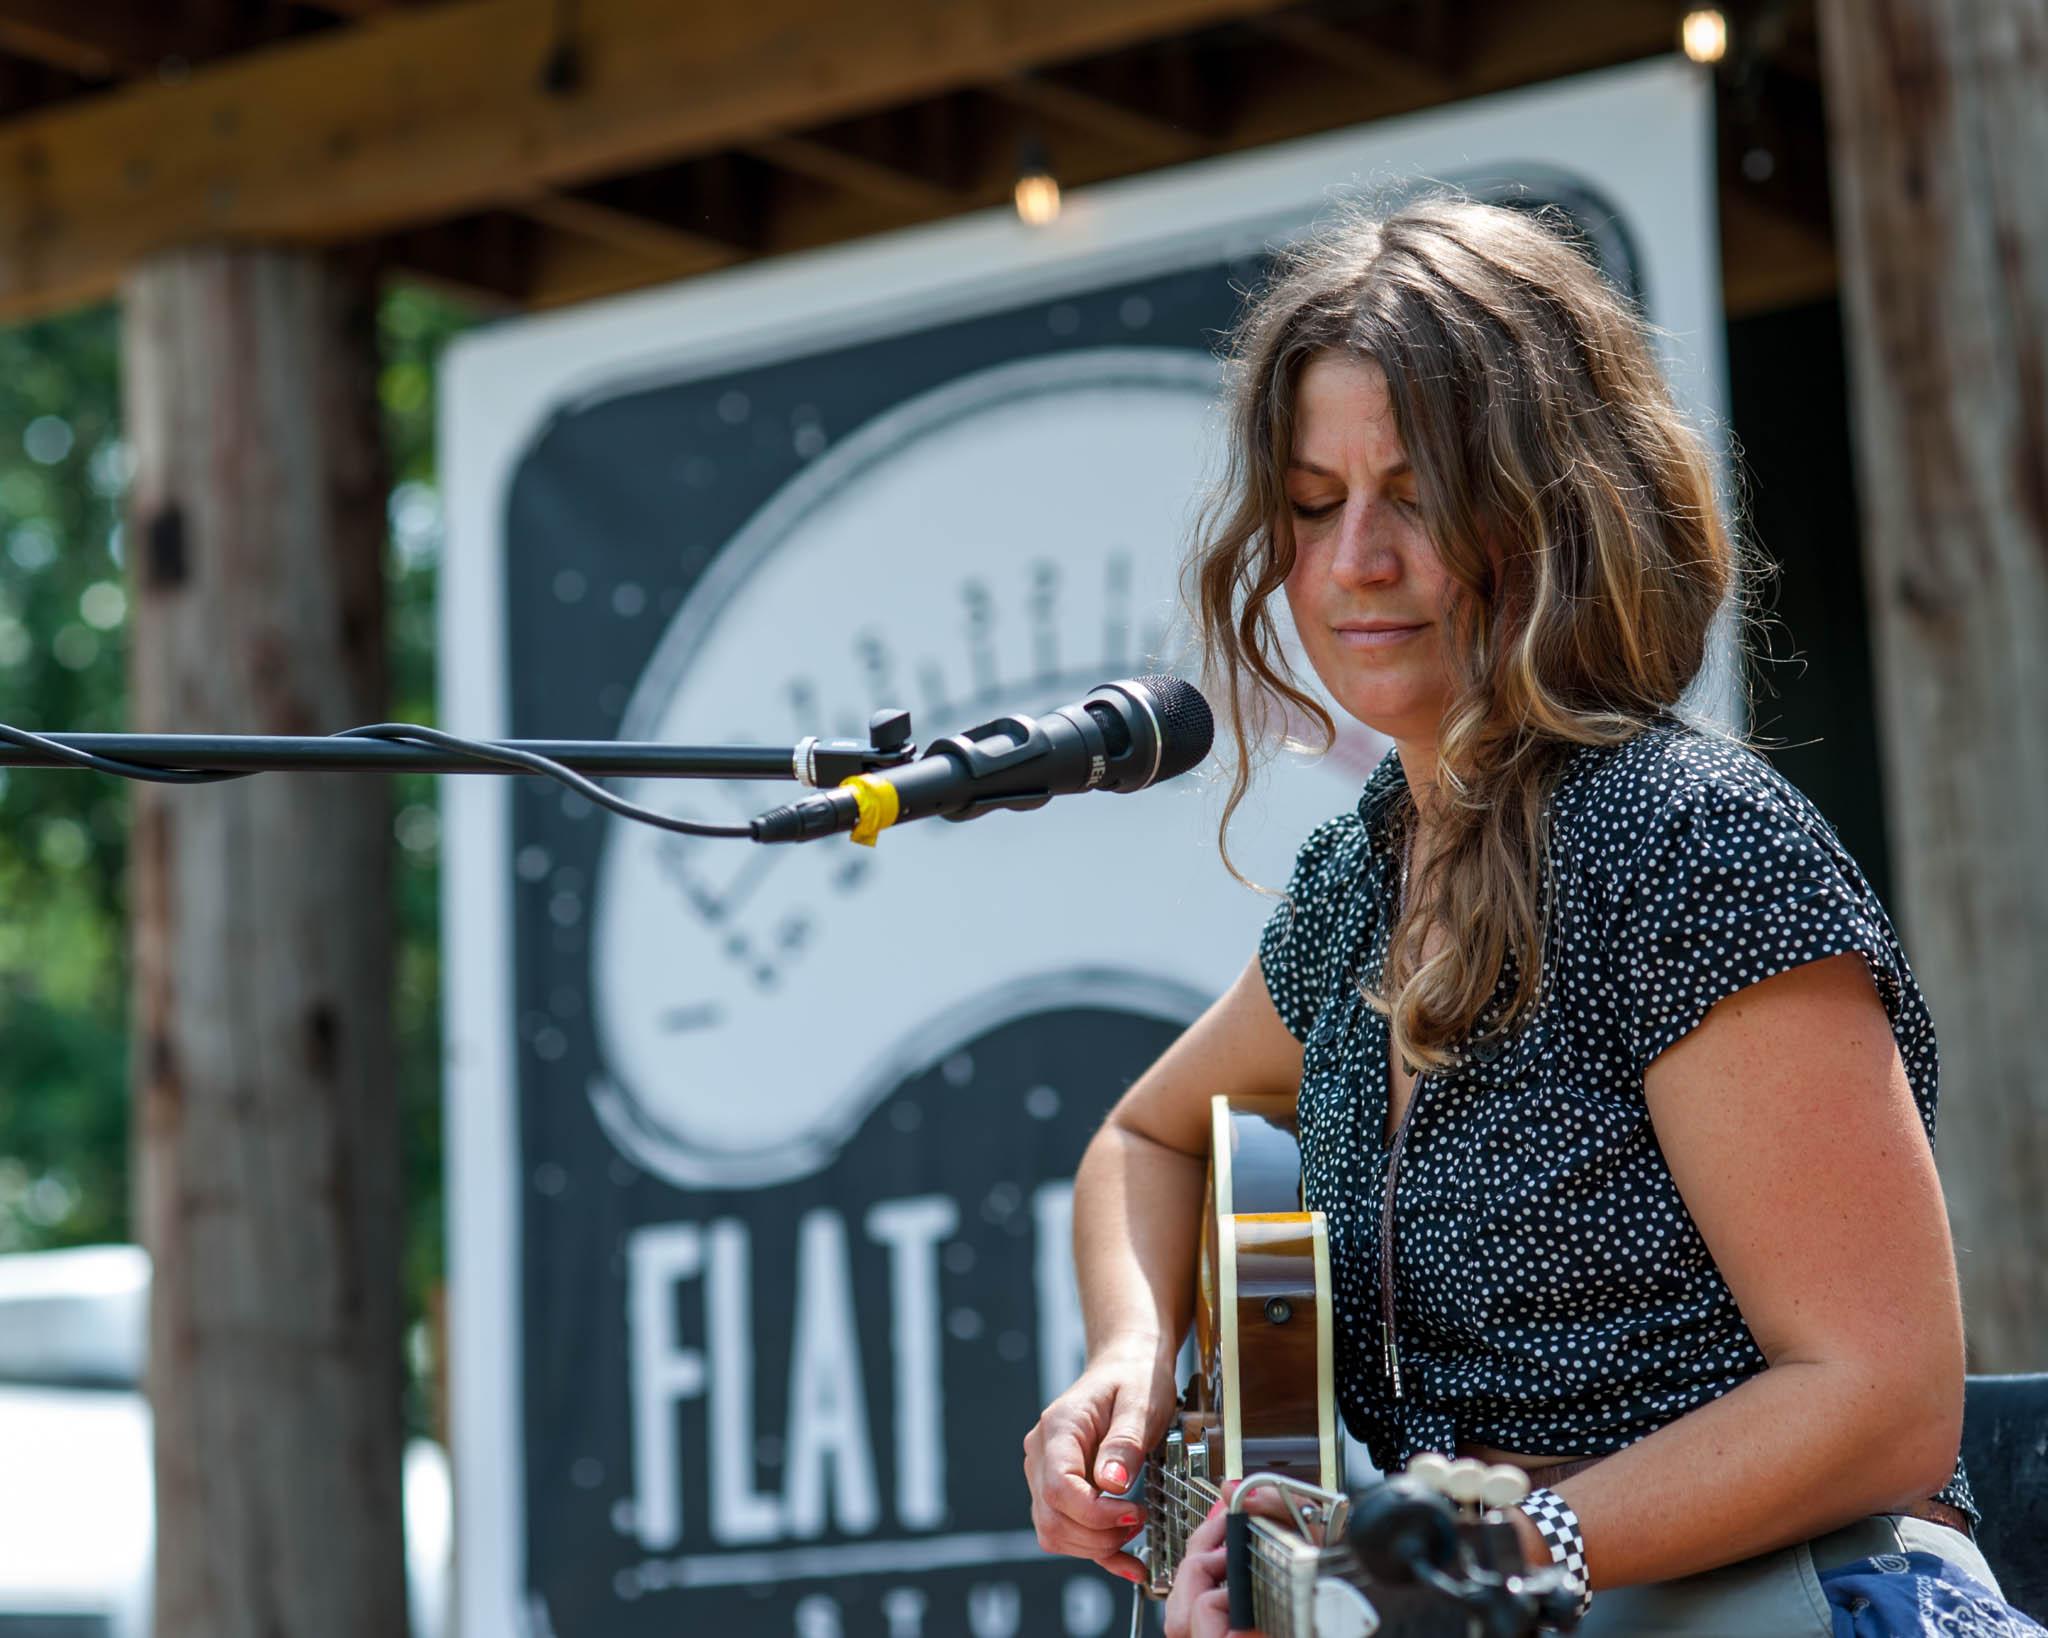 Jordan Sellergren playing Grey Area 2018 at Flat Black Studios near Iowa City